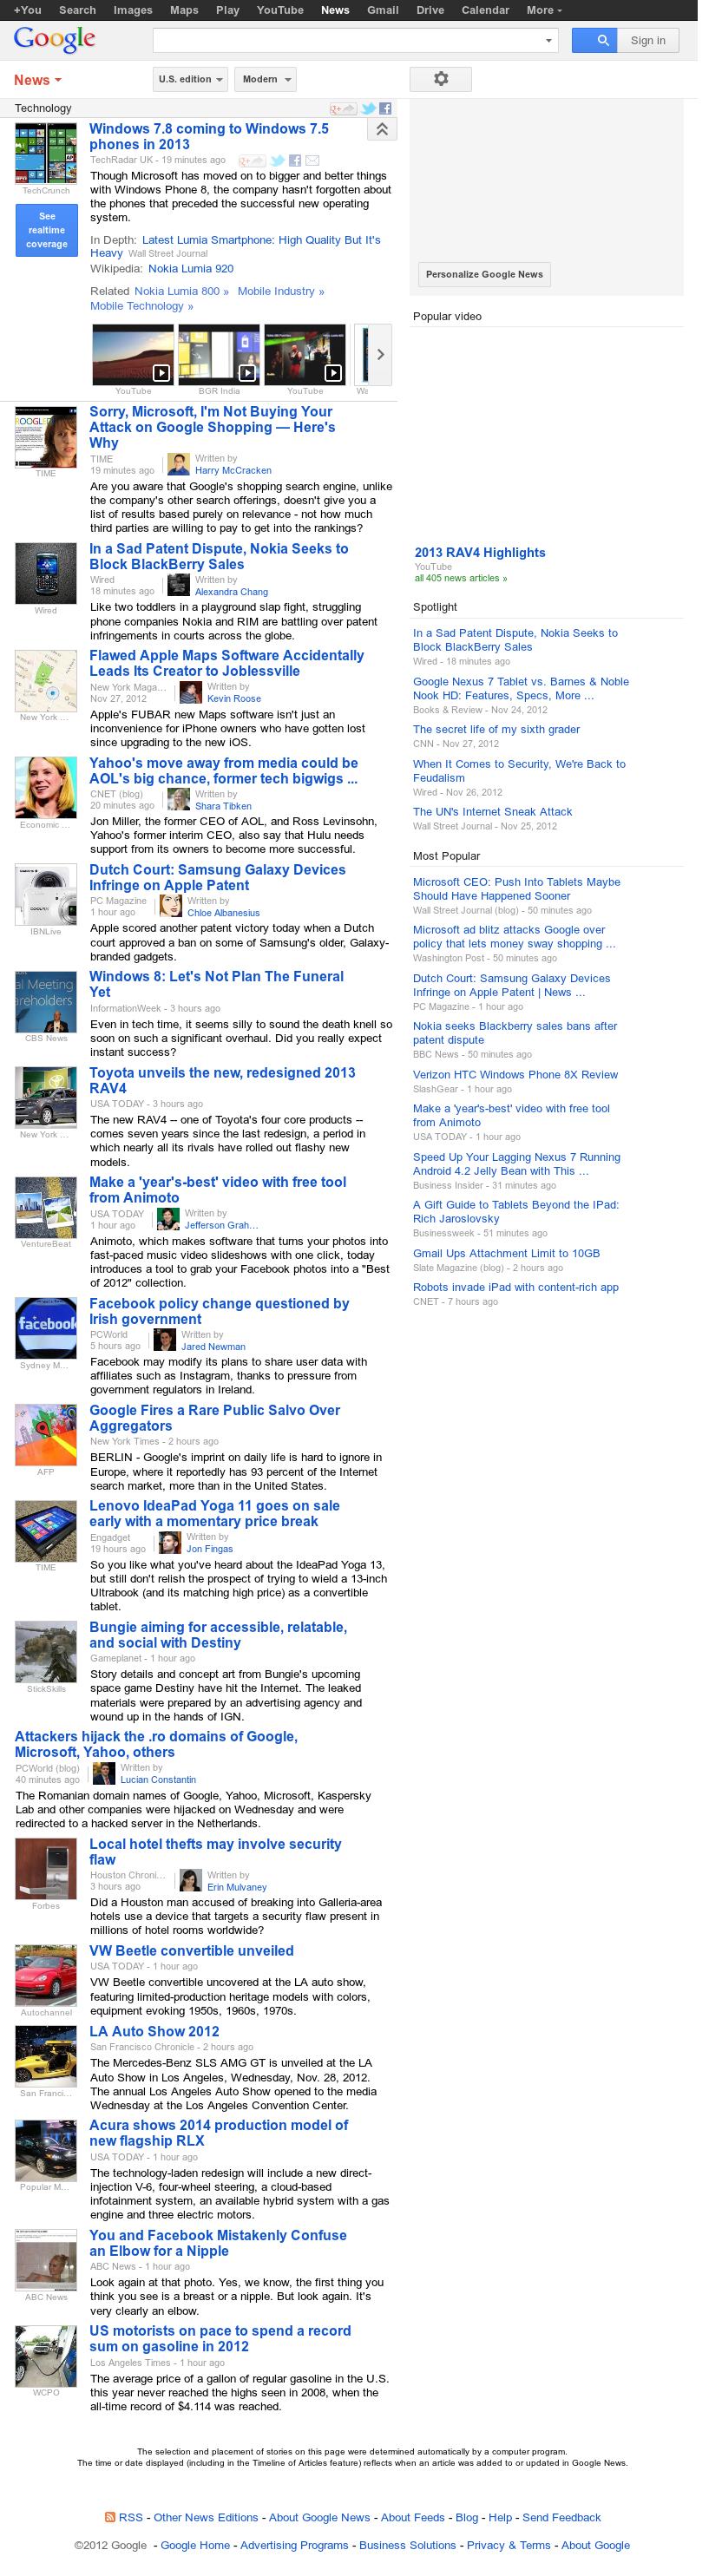 Google News: Technology at Wednesday Nov. 28, 2012, 10:12 p.m. UTC